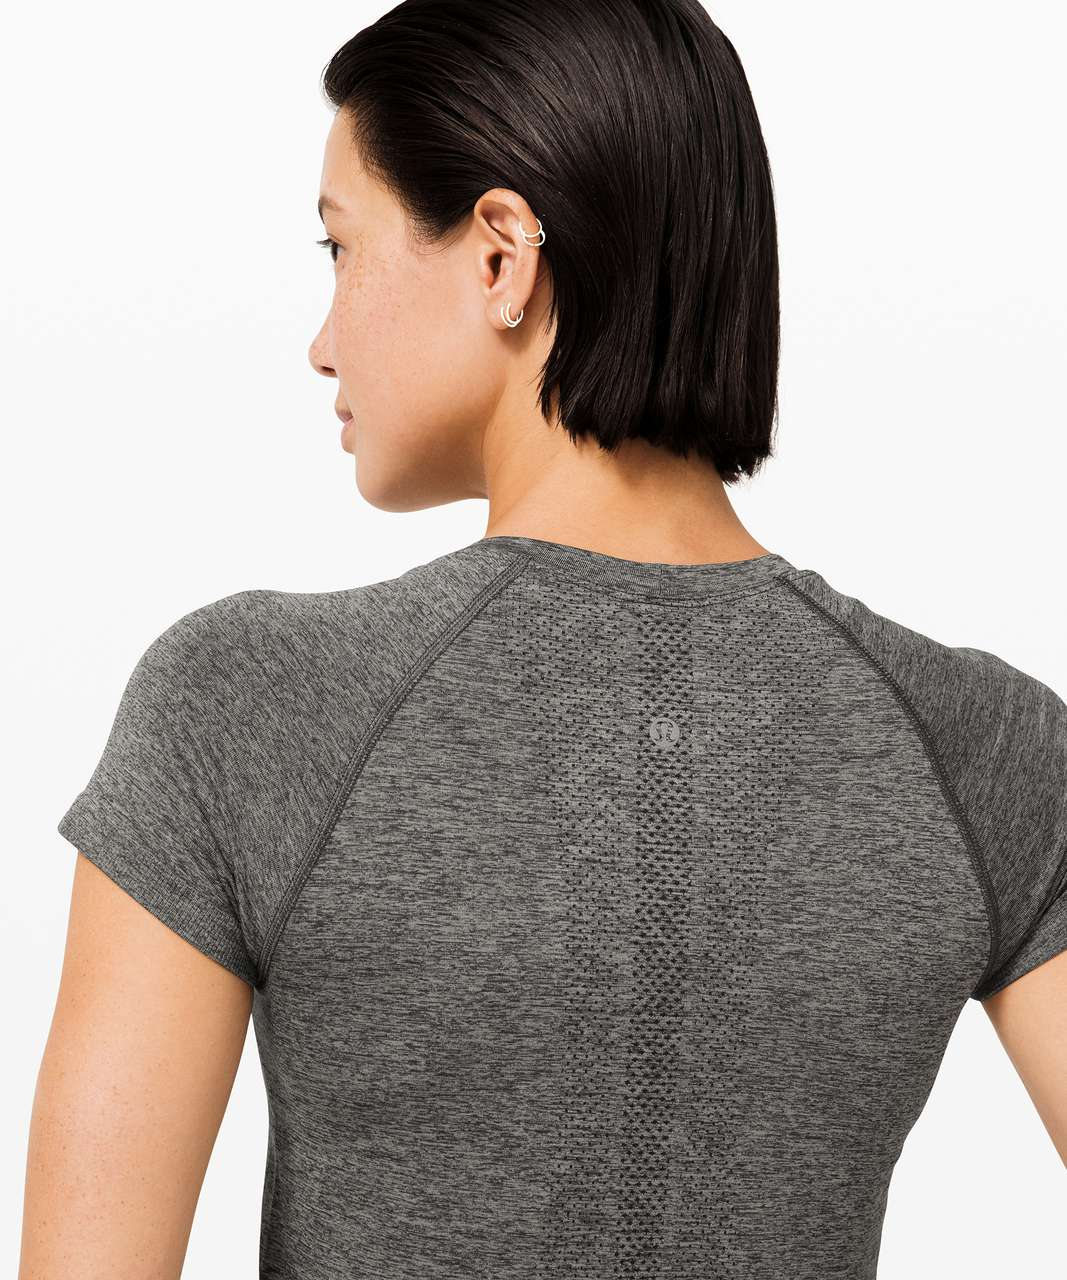 Lululemon Swiftly Tech Short Sleeve 2.0 *Race - Graphite Grey / Silver Drop